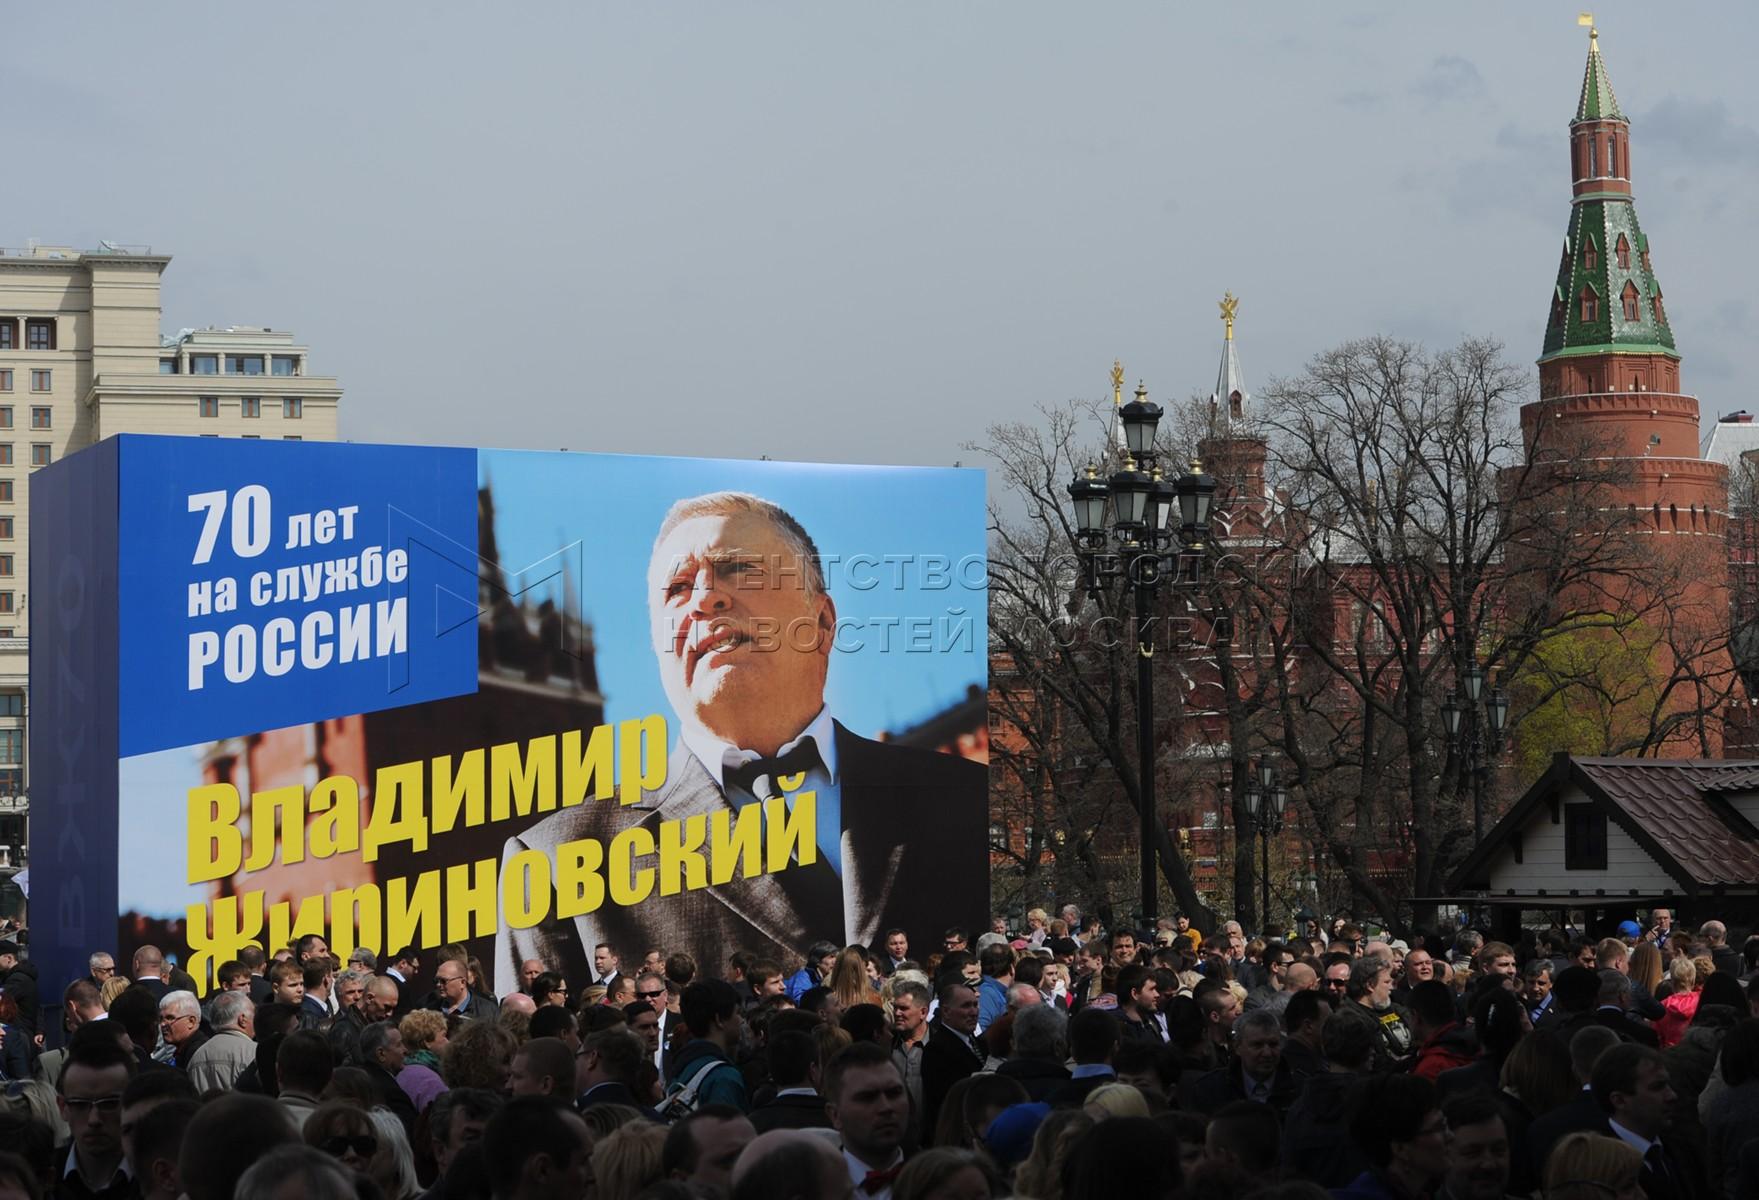 Юбилей лидера партии ЛДПР Владимира Жириновского в Манеже